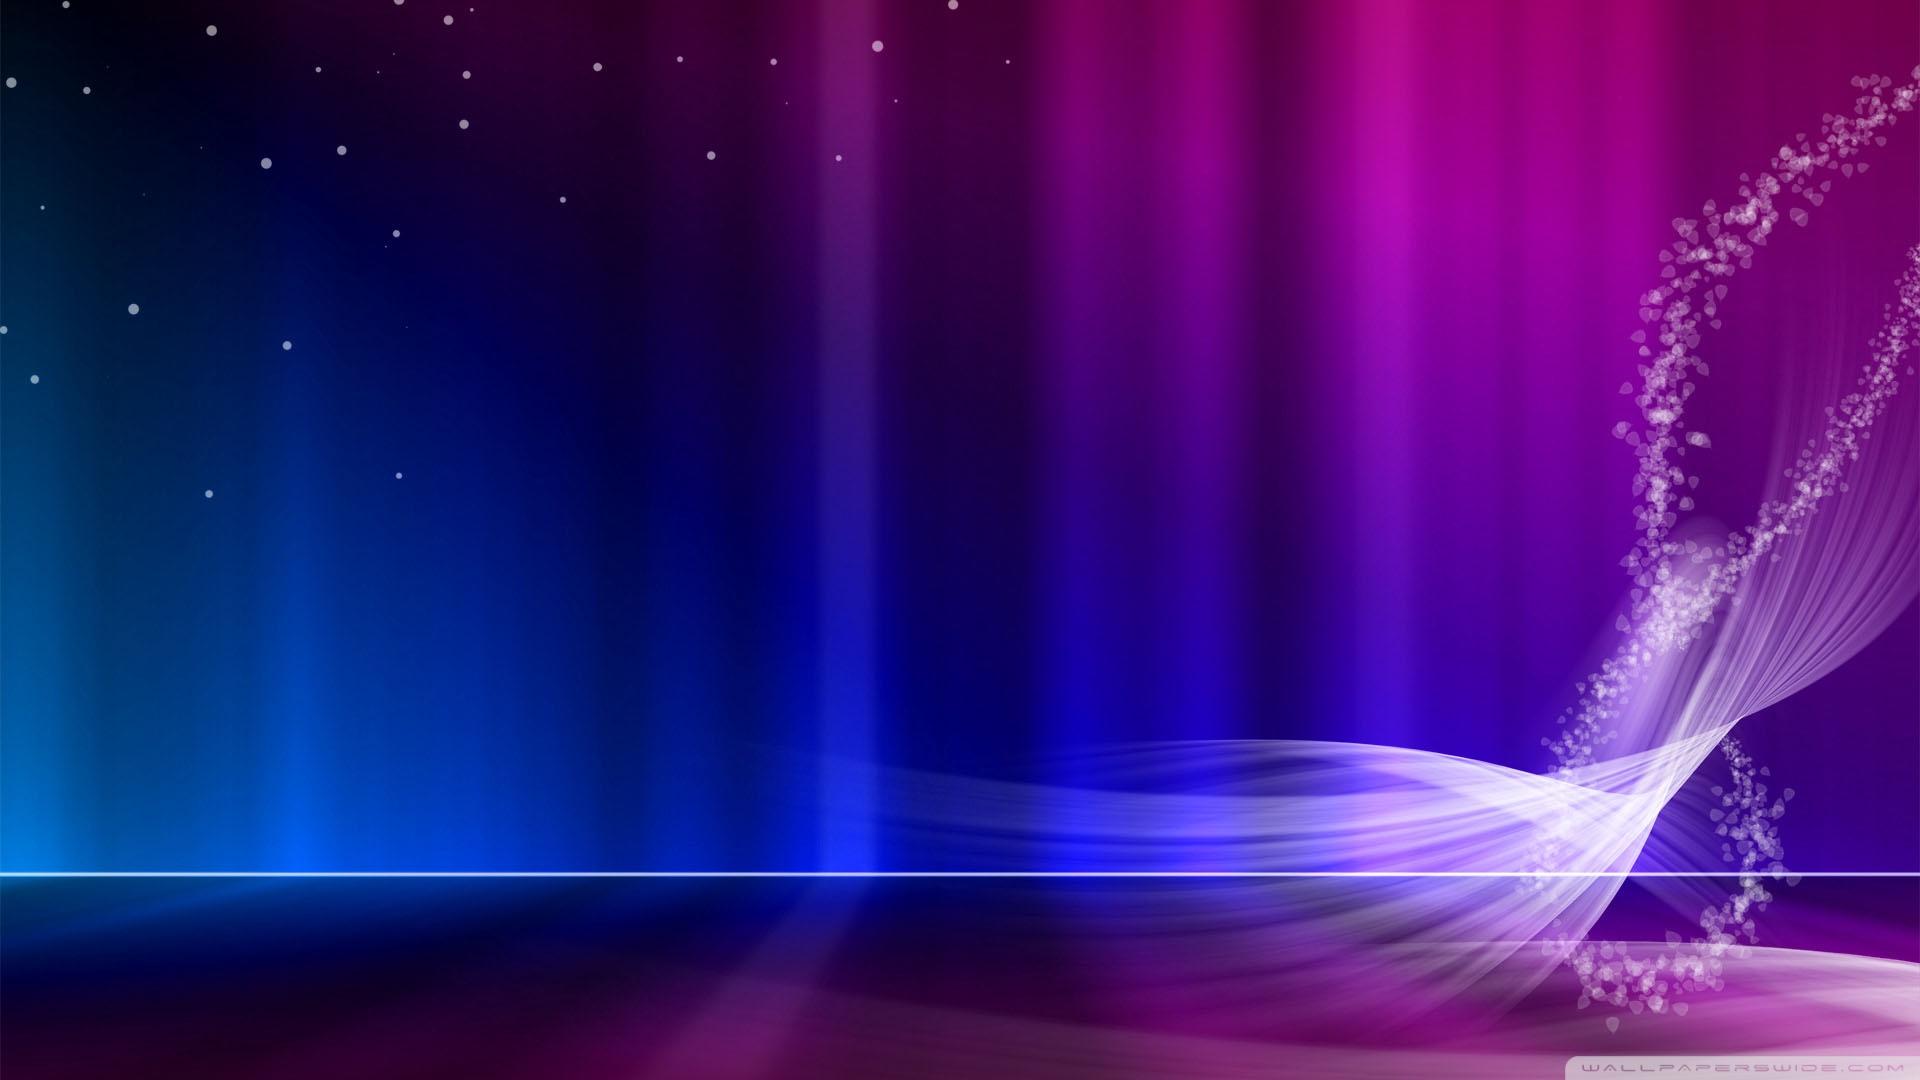 Background Image Purple wallpaper hd